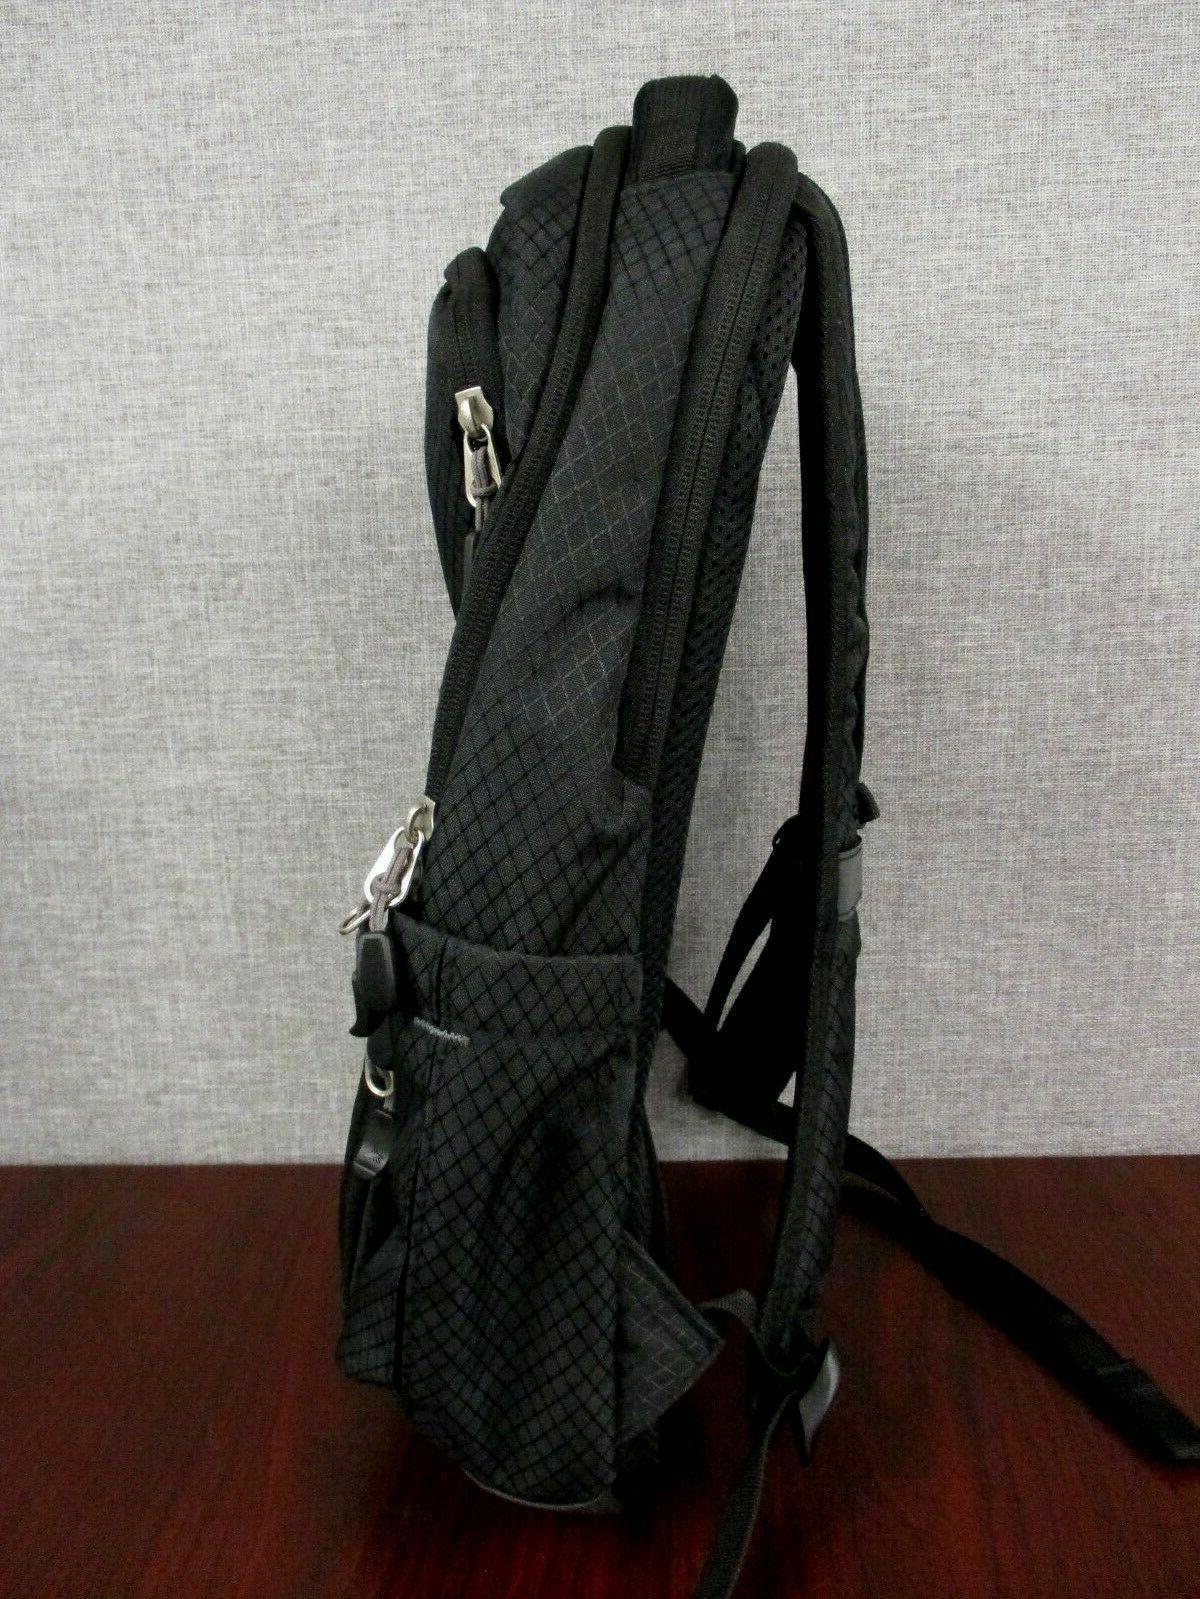 Everyday Backpack Black - Light